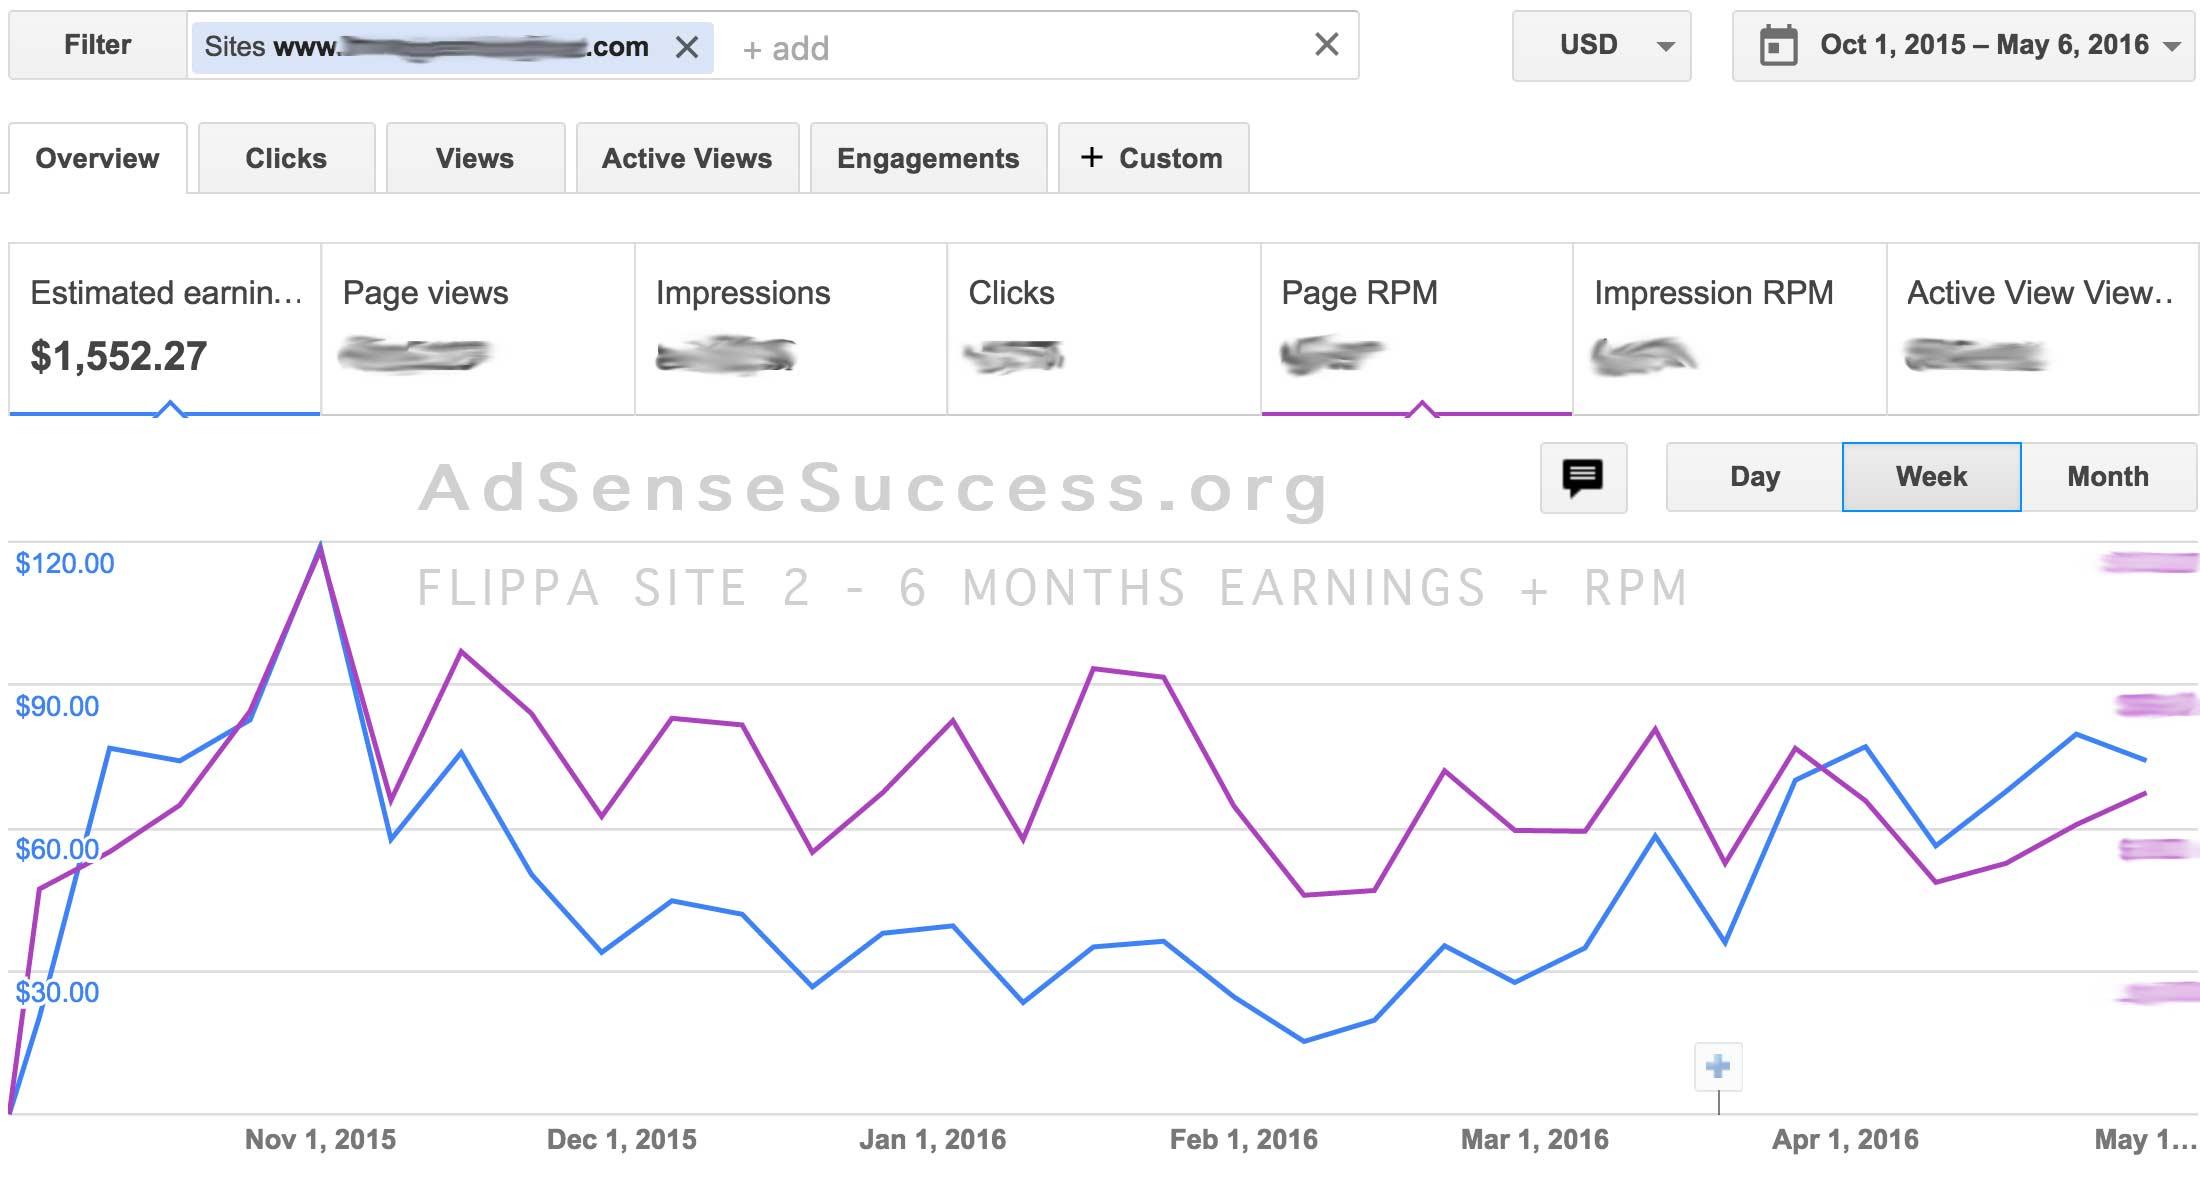 6-Months-Earnings-RPM-Flippa-Site-2